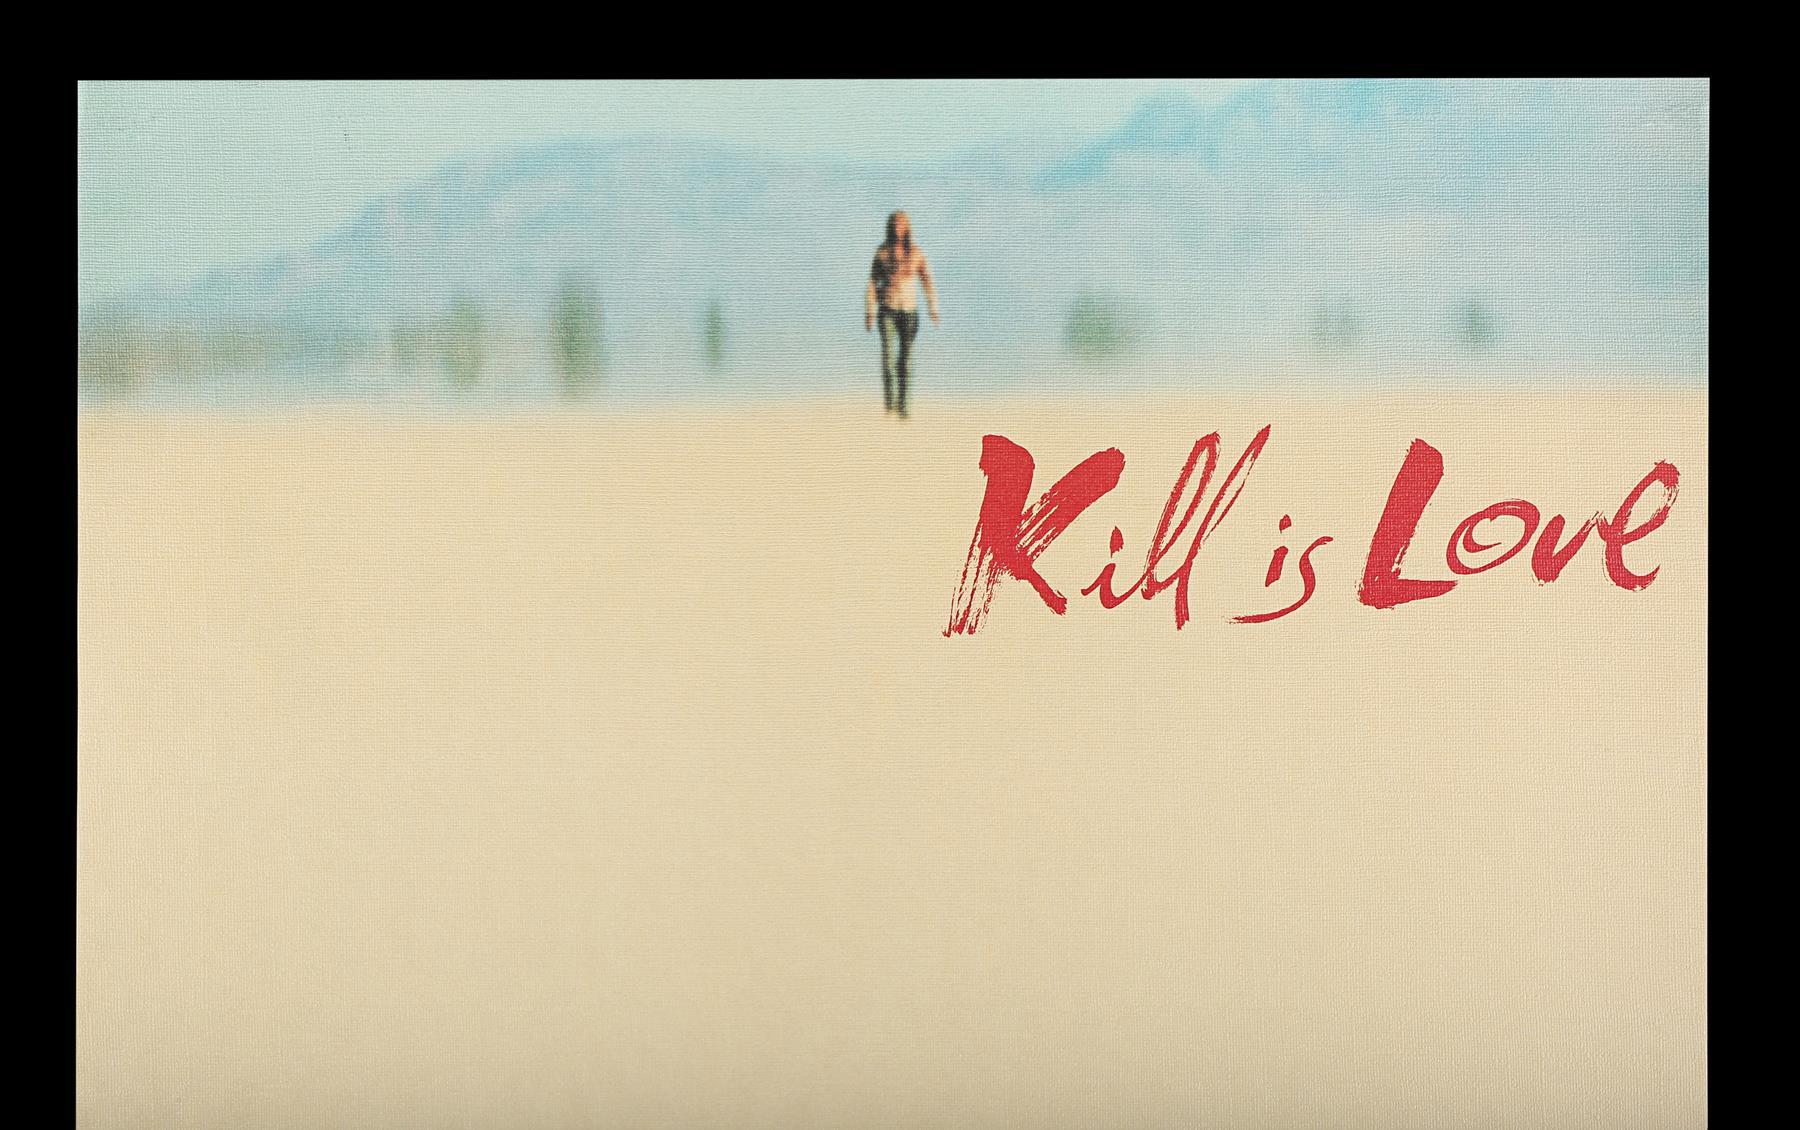 KILL BILL: VOLUME II (2004) - Japanese B1, 2004, Autographed by Uma Thurman - Image 2 of 5